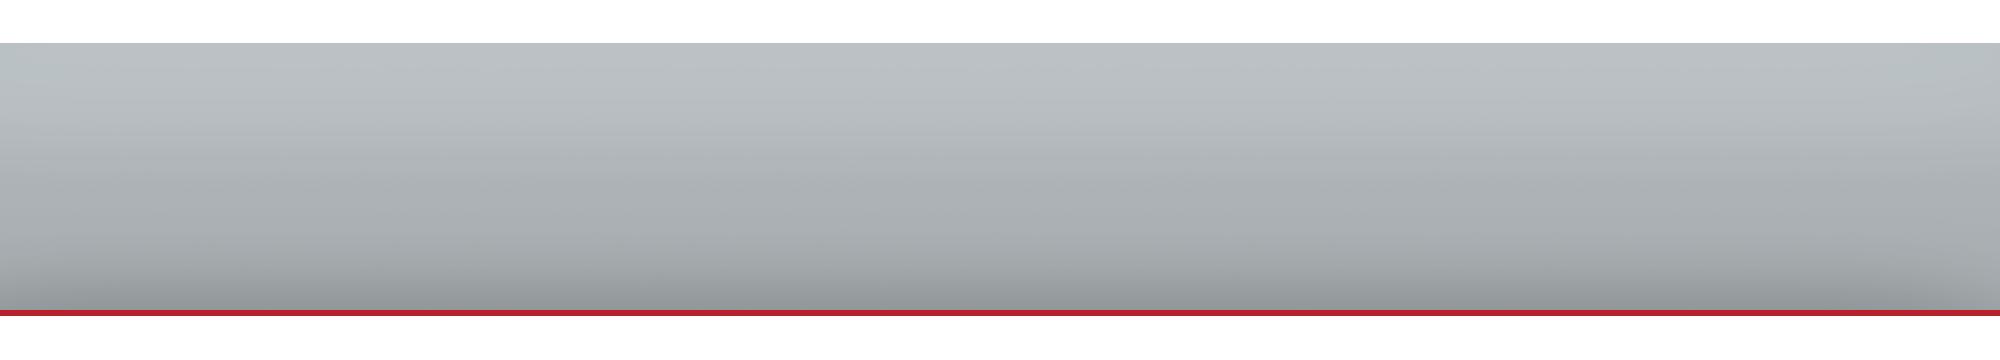 Senilife-Widget-Background